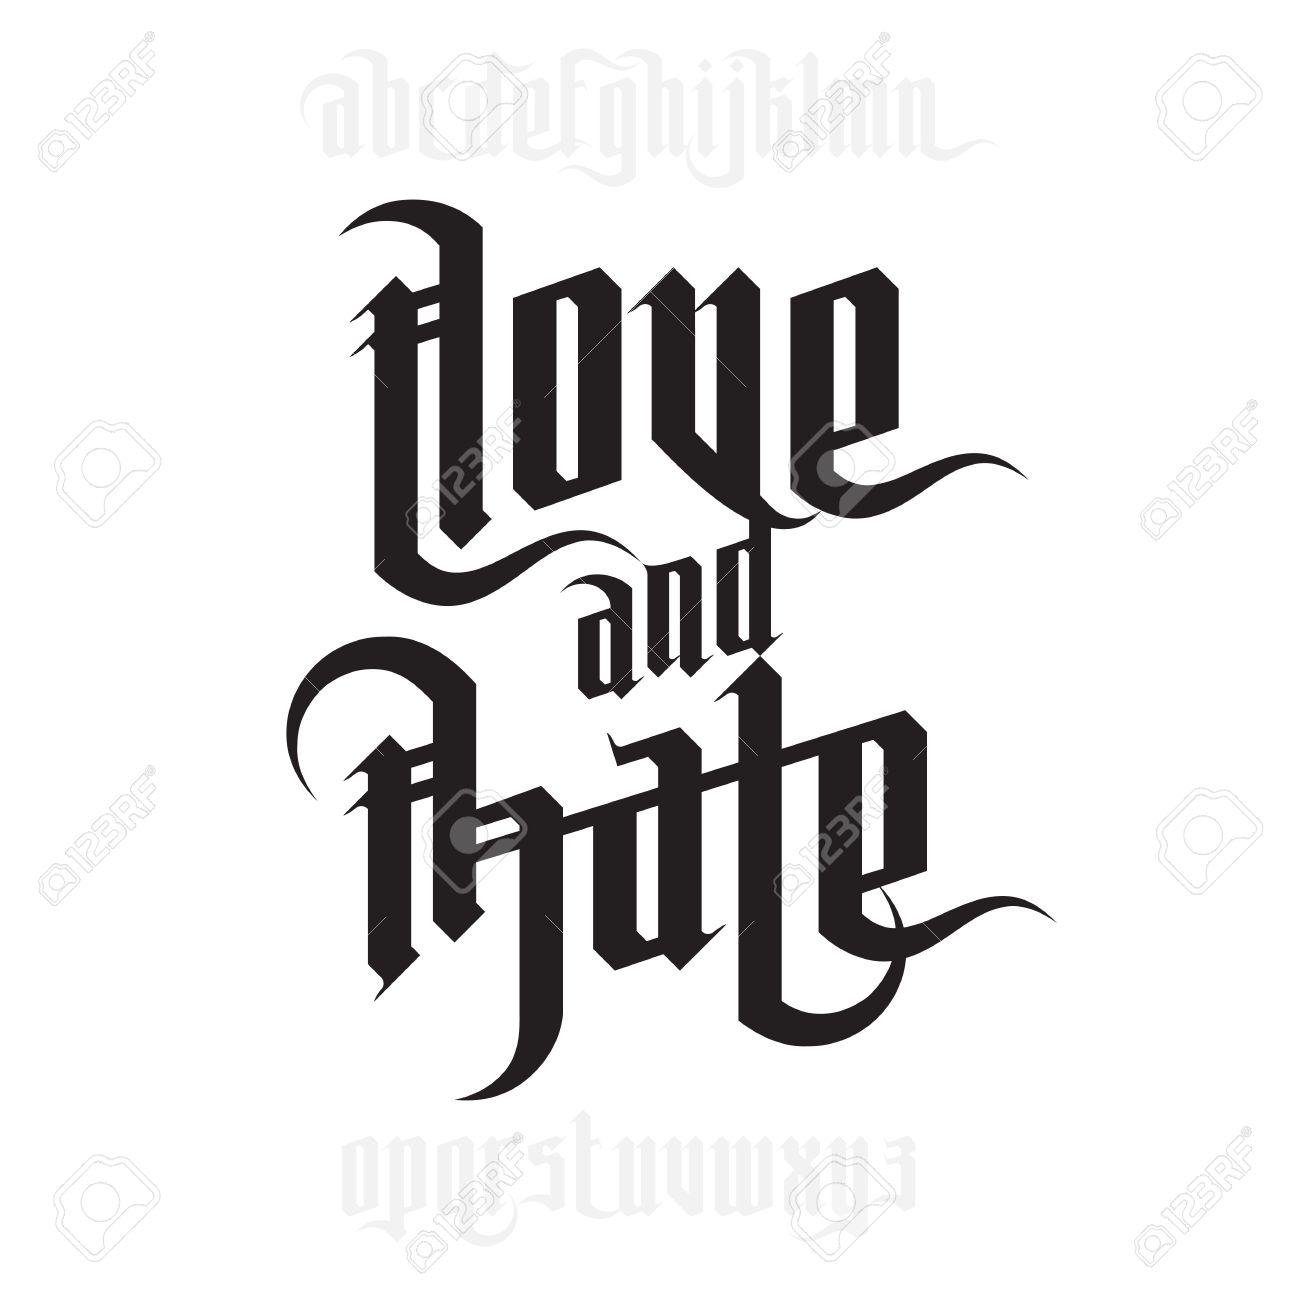 Tatouage lettre gothique galerie tatouage tatouage lettre gothique tatouage paon amour et la haine lettrage modern style font gothique thecheapjerseys Image collections